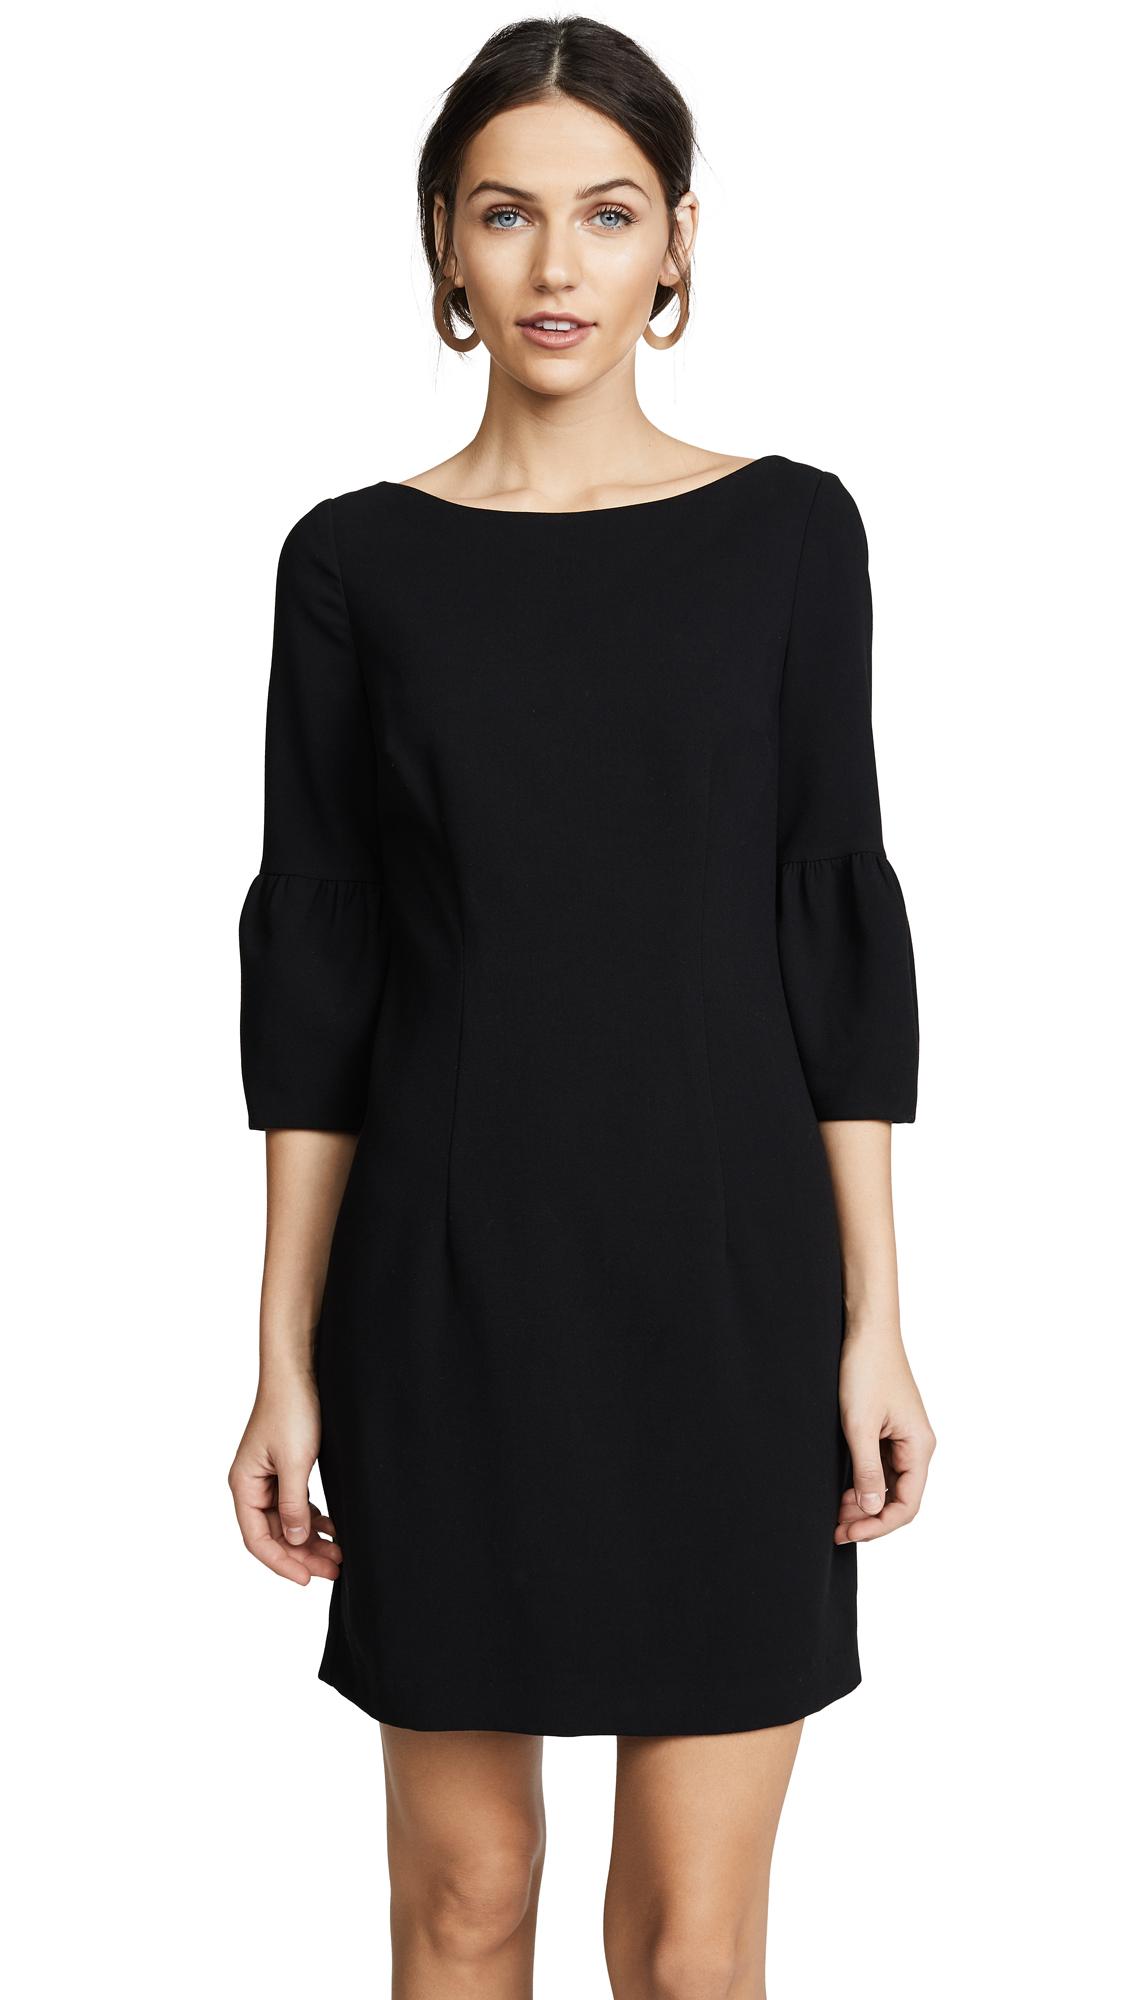 Black Halo Mooreland Mini Dress - Black